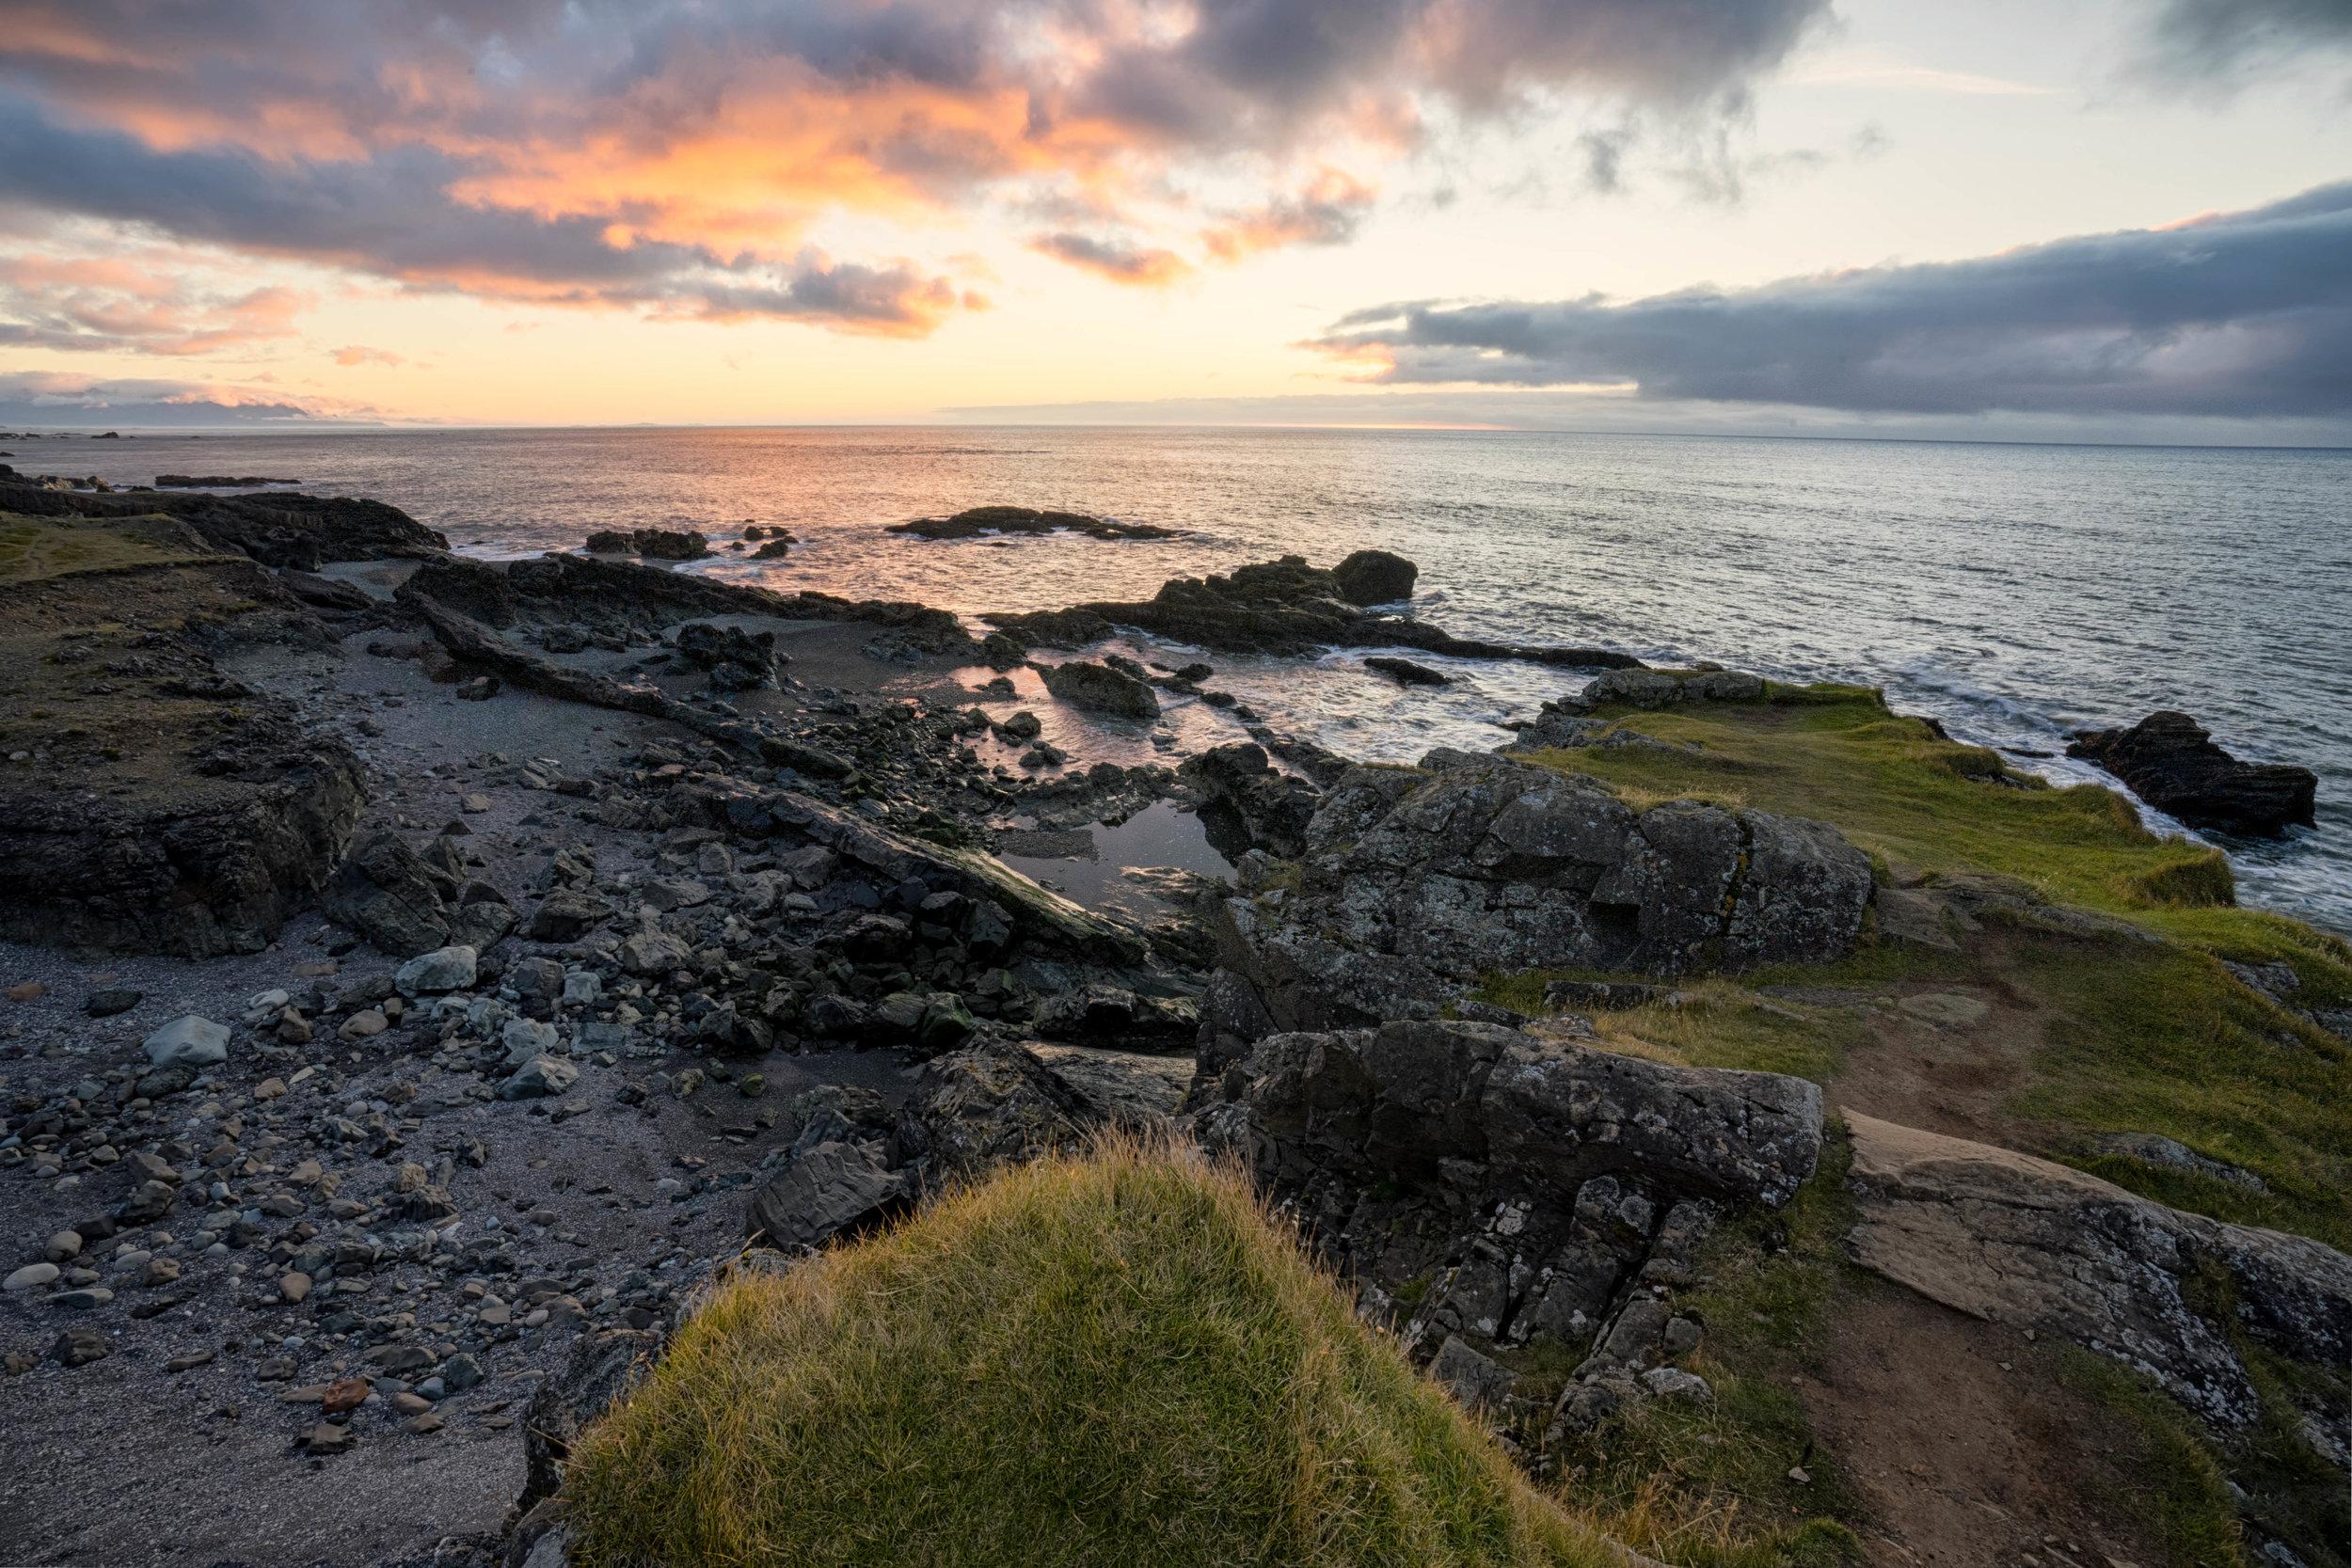 Iceland - 00667-2-HDR_ME - Chris Goetchius 2017.jpg